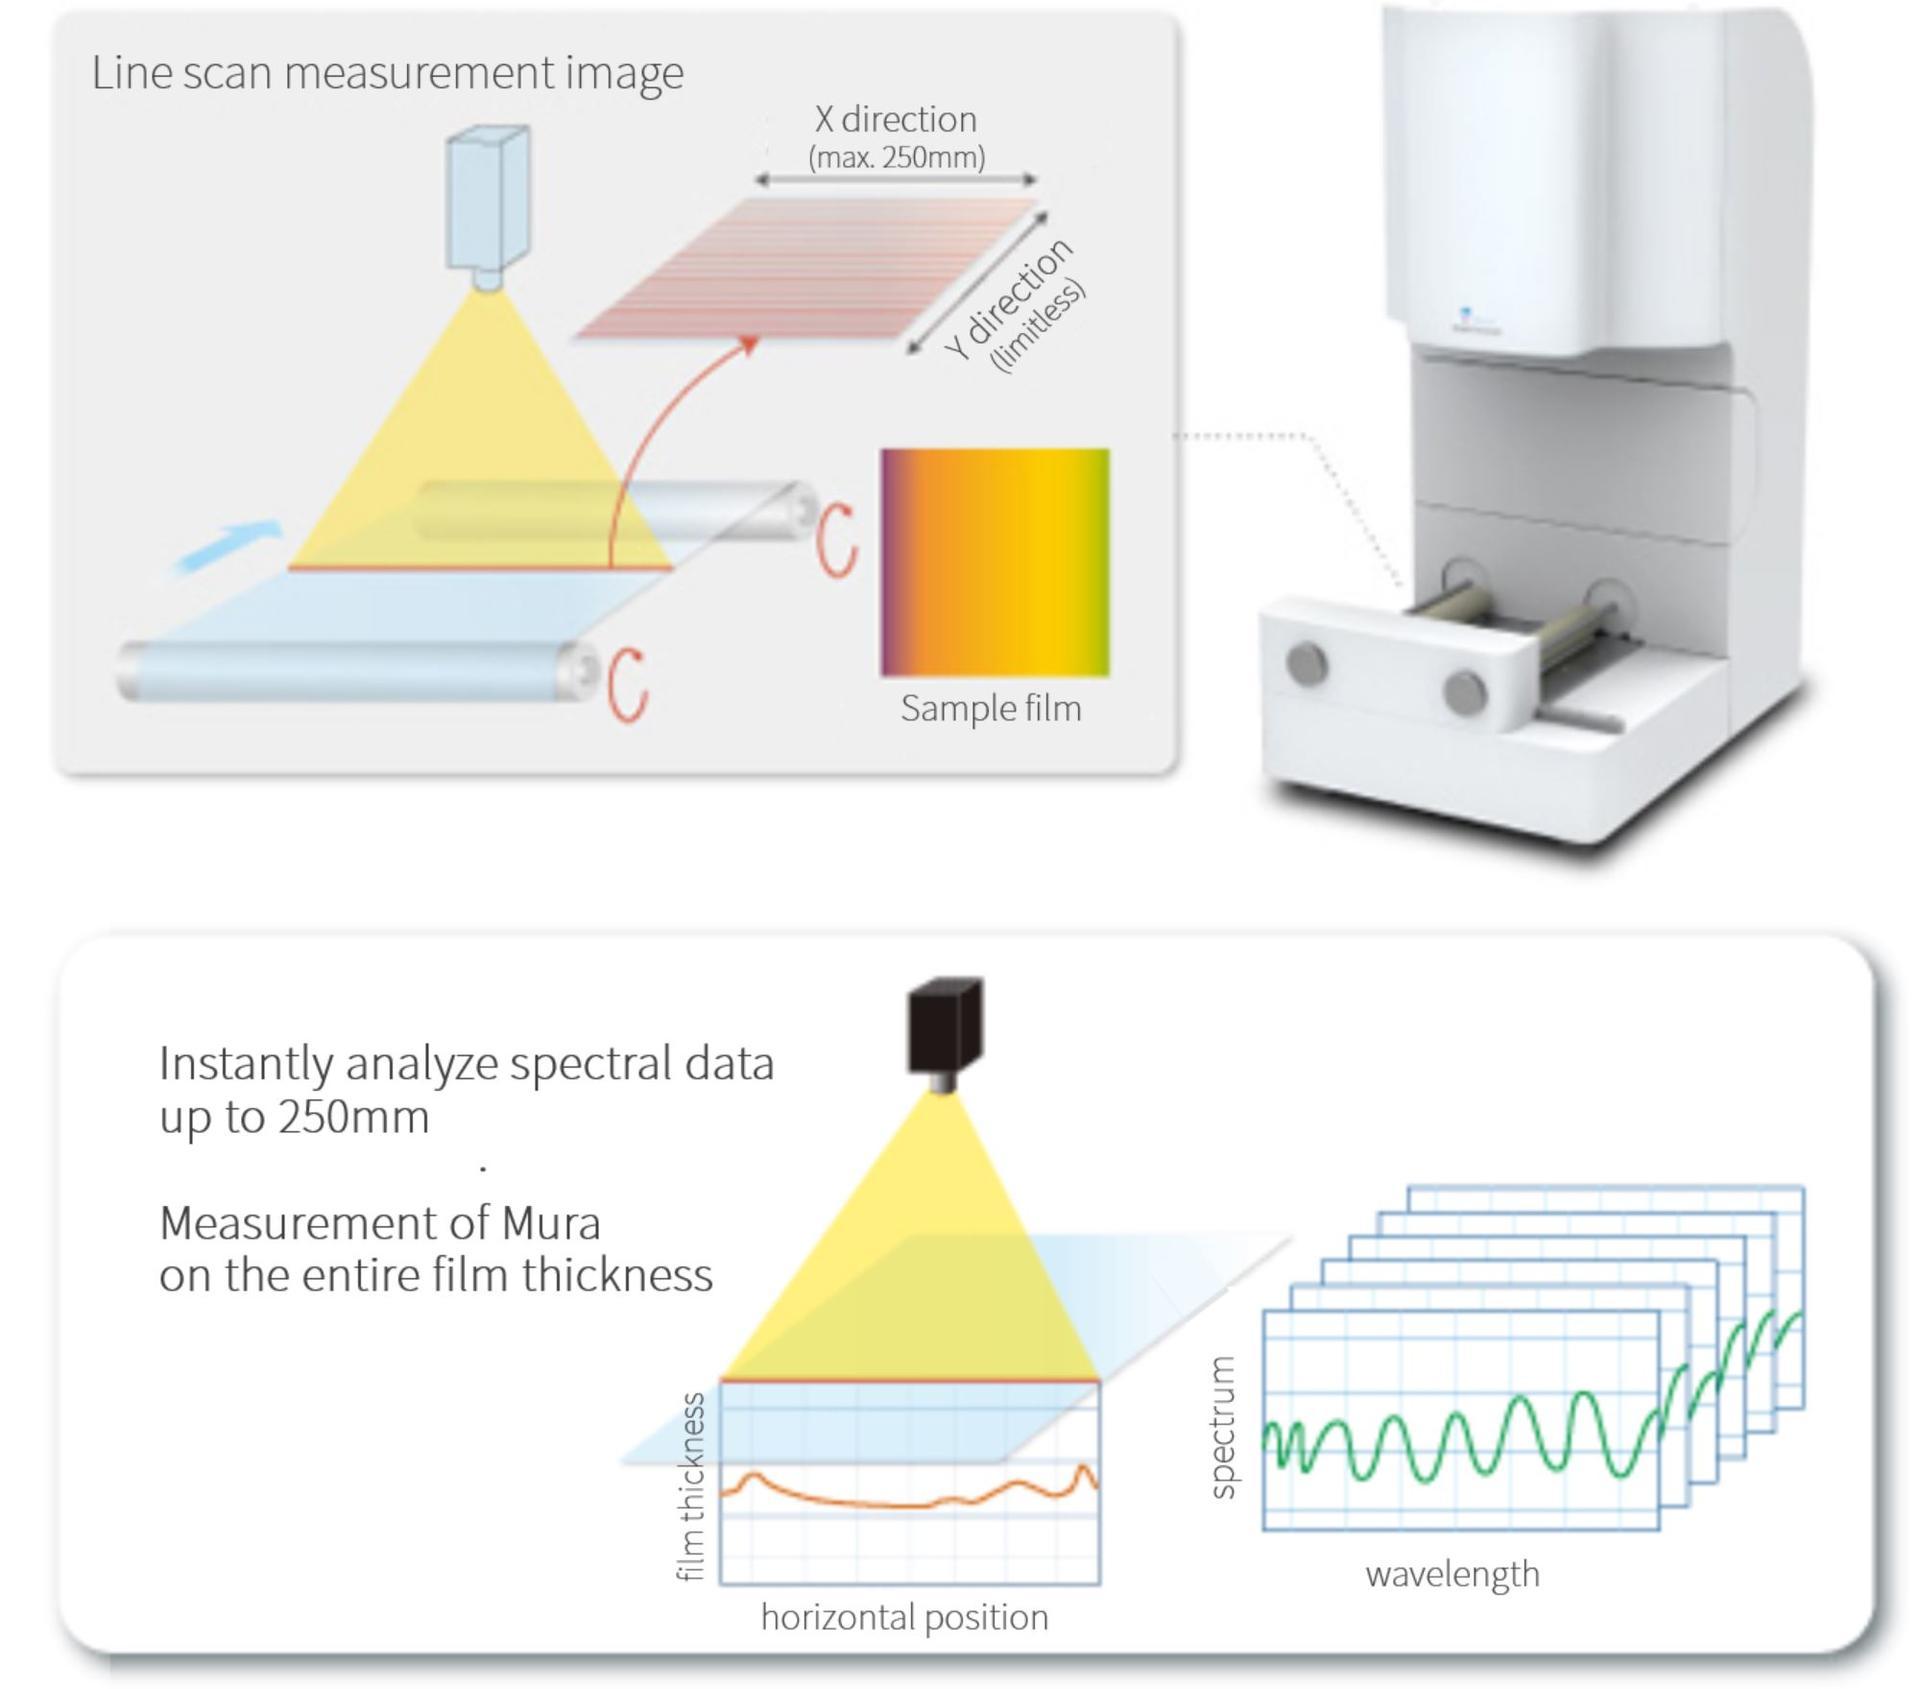 Measurement process image